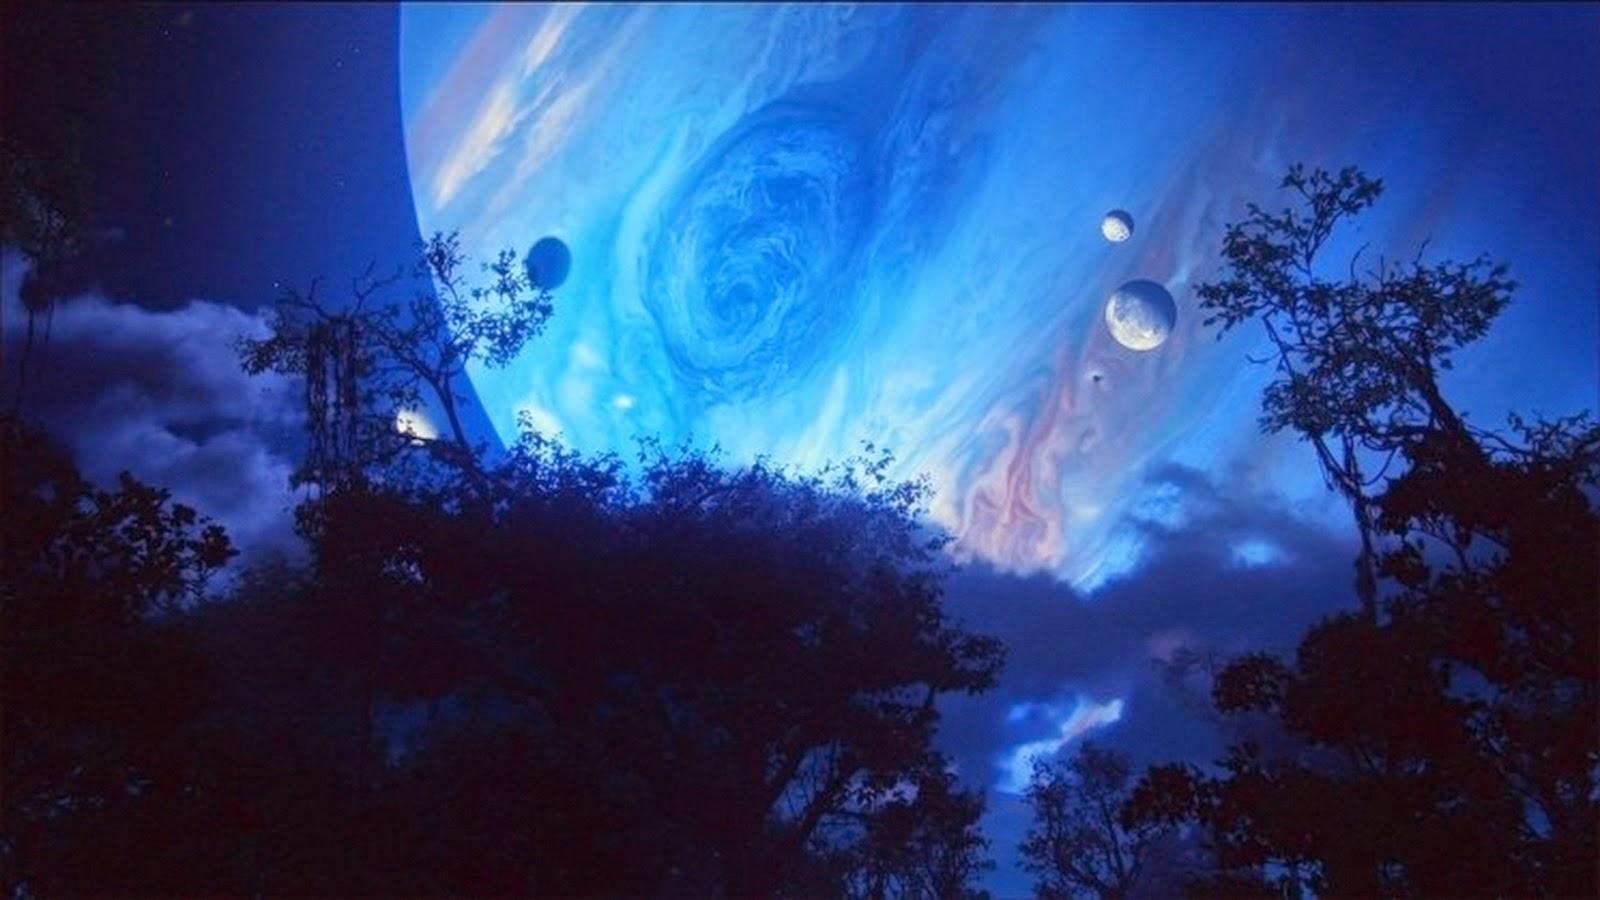 Amazing Planet Full HD Desktop Backgrounds Images